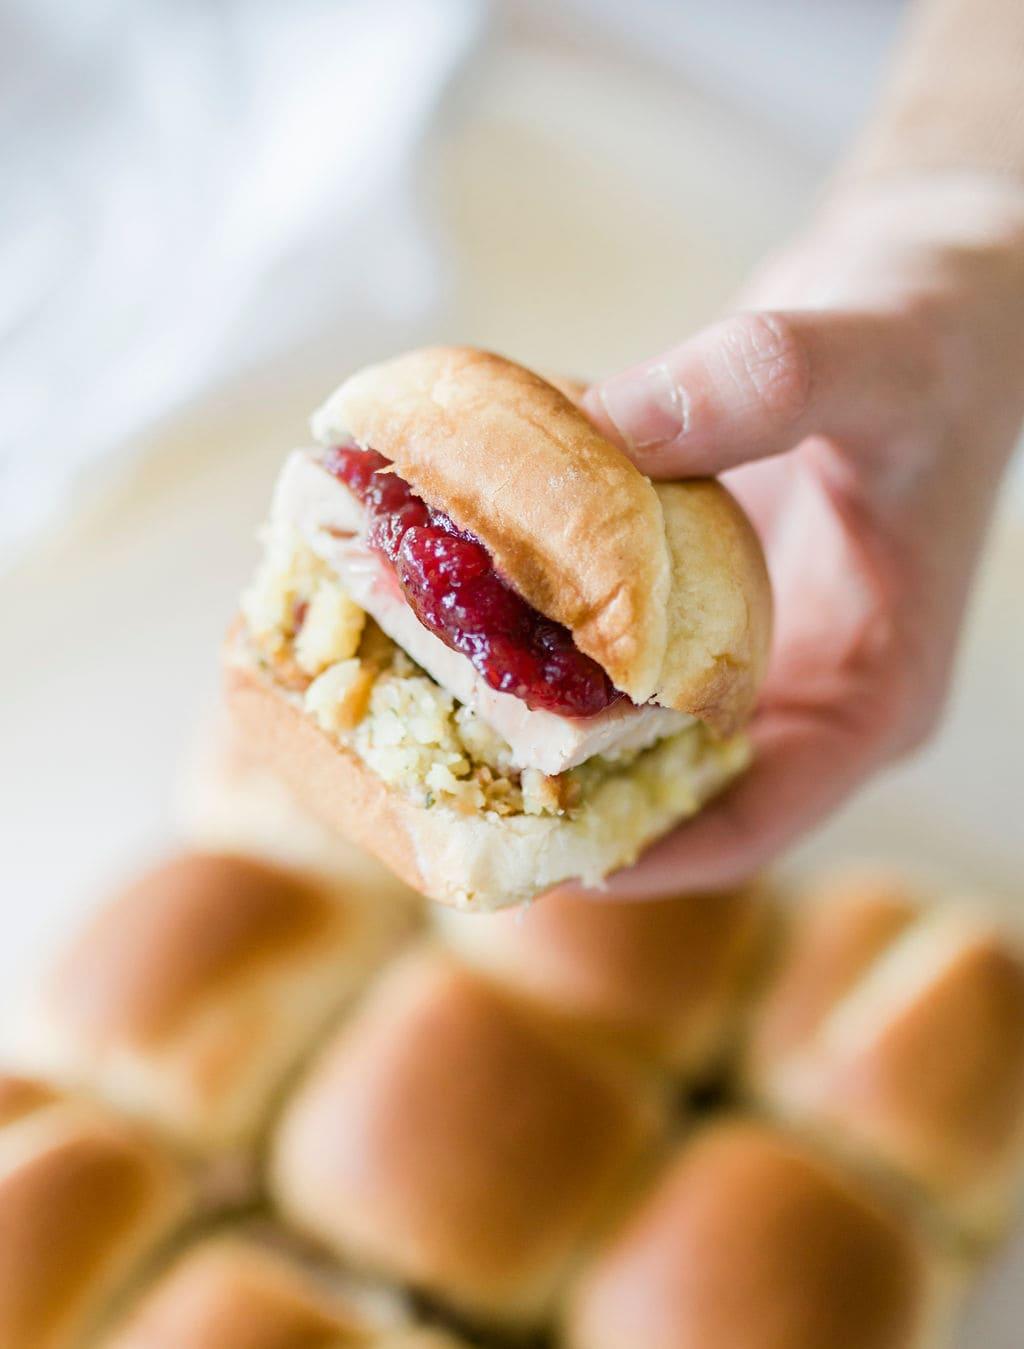 holding sandwich